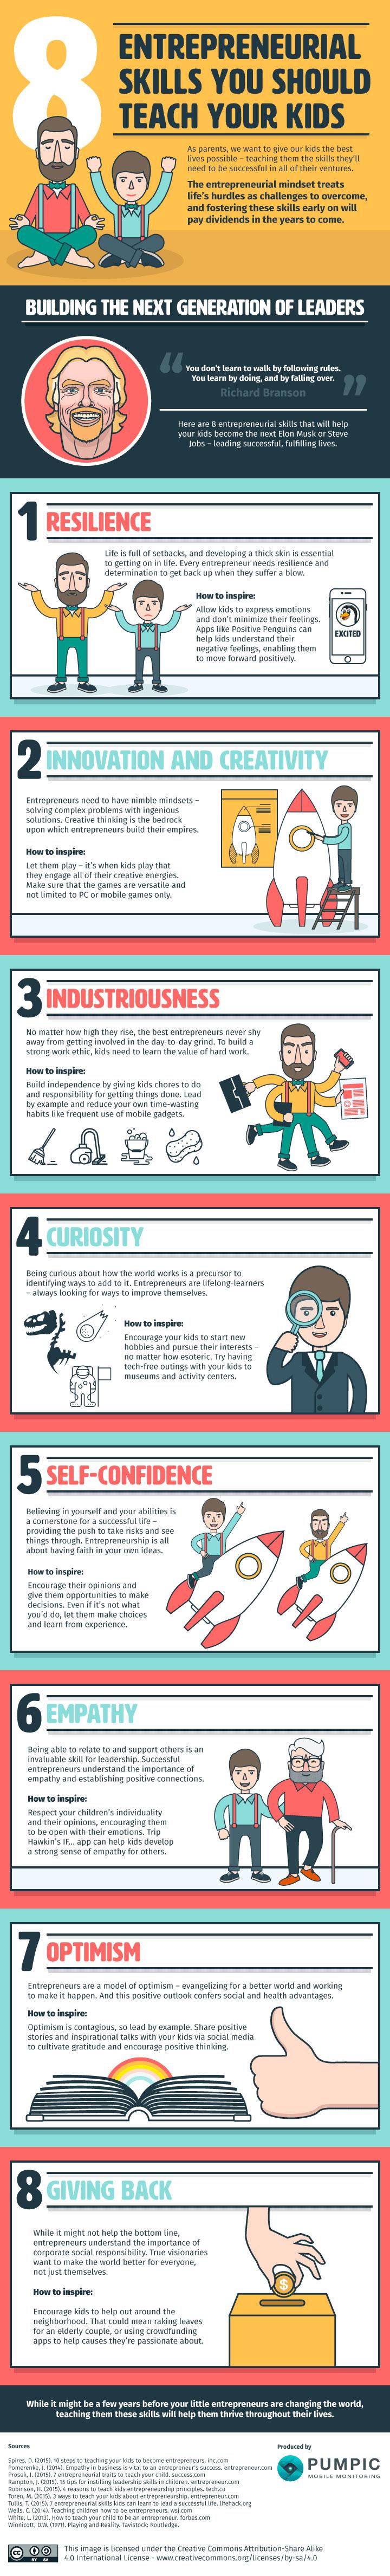 entrepreneurial-skills-teach-your-kids